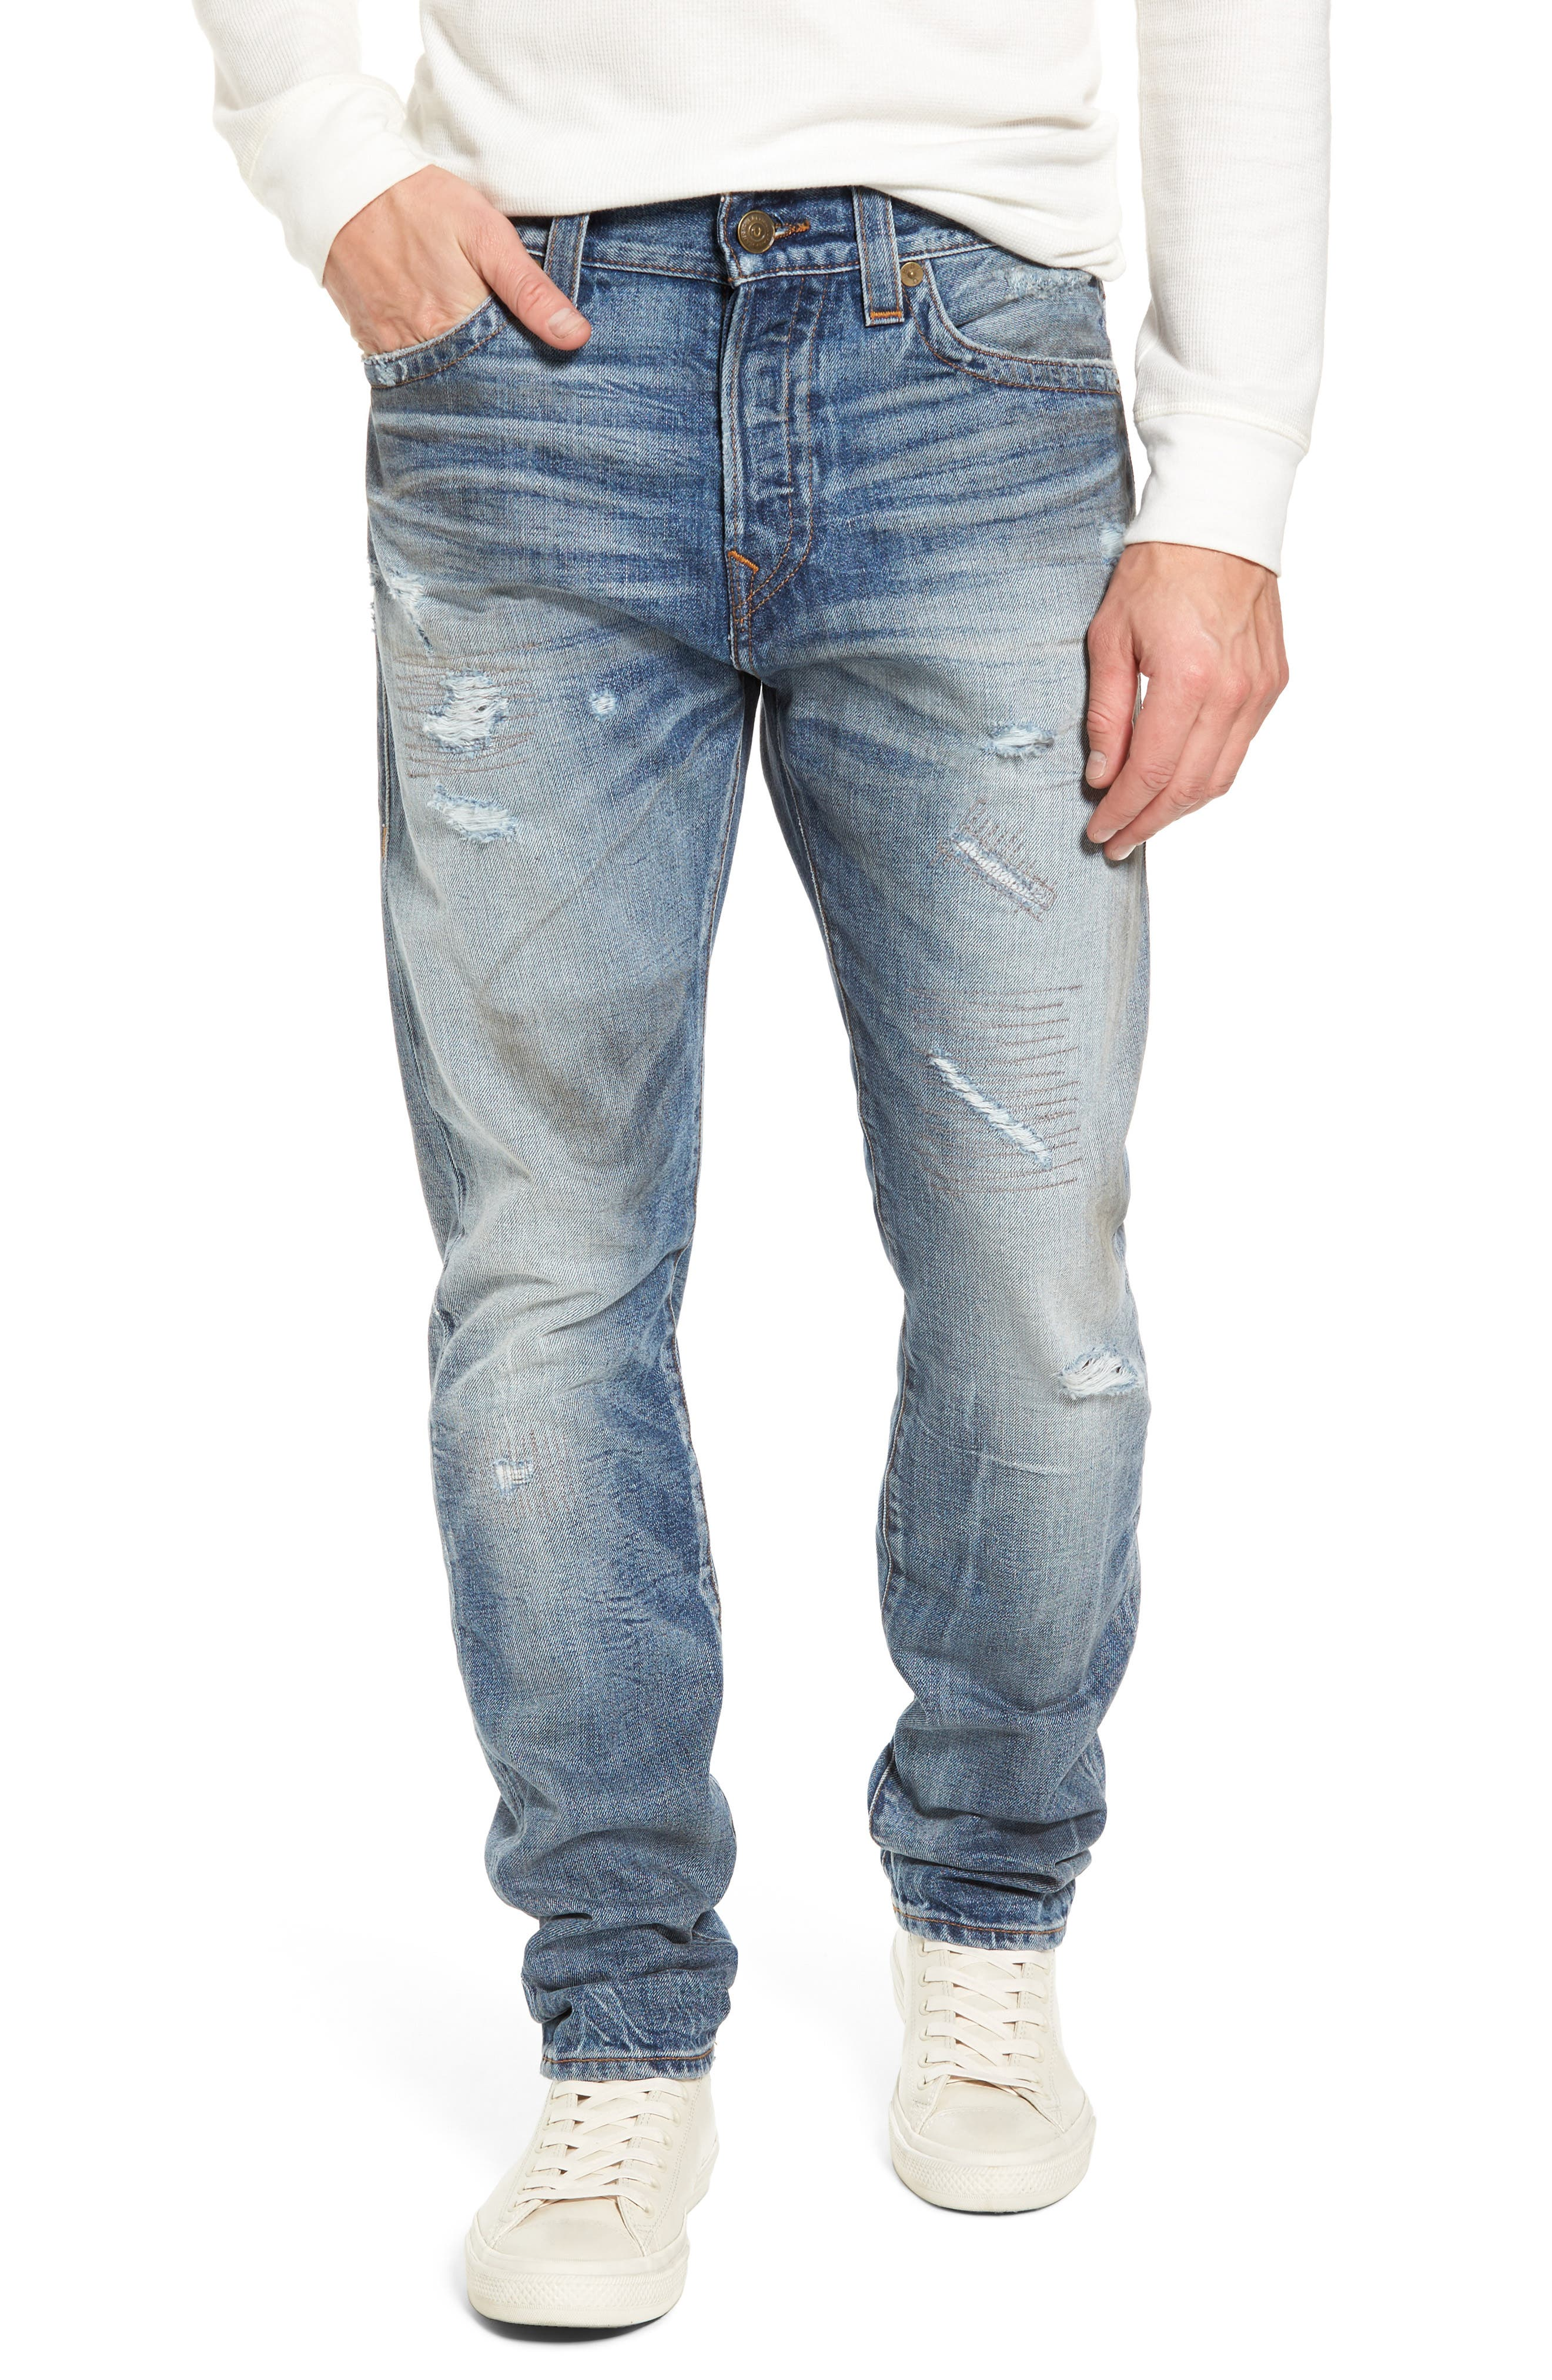 Logan Slim Straight Fit Jeans,                         Main,                         color, Mended Street Brawl